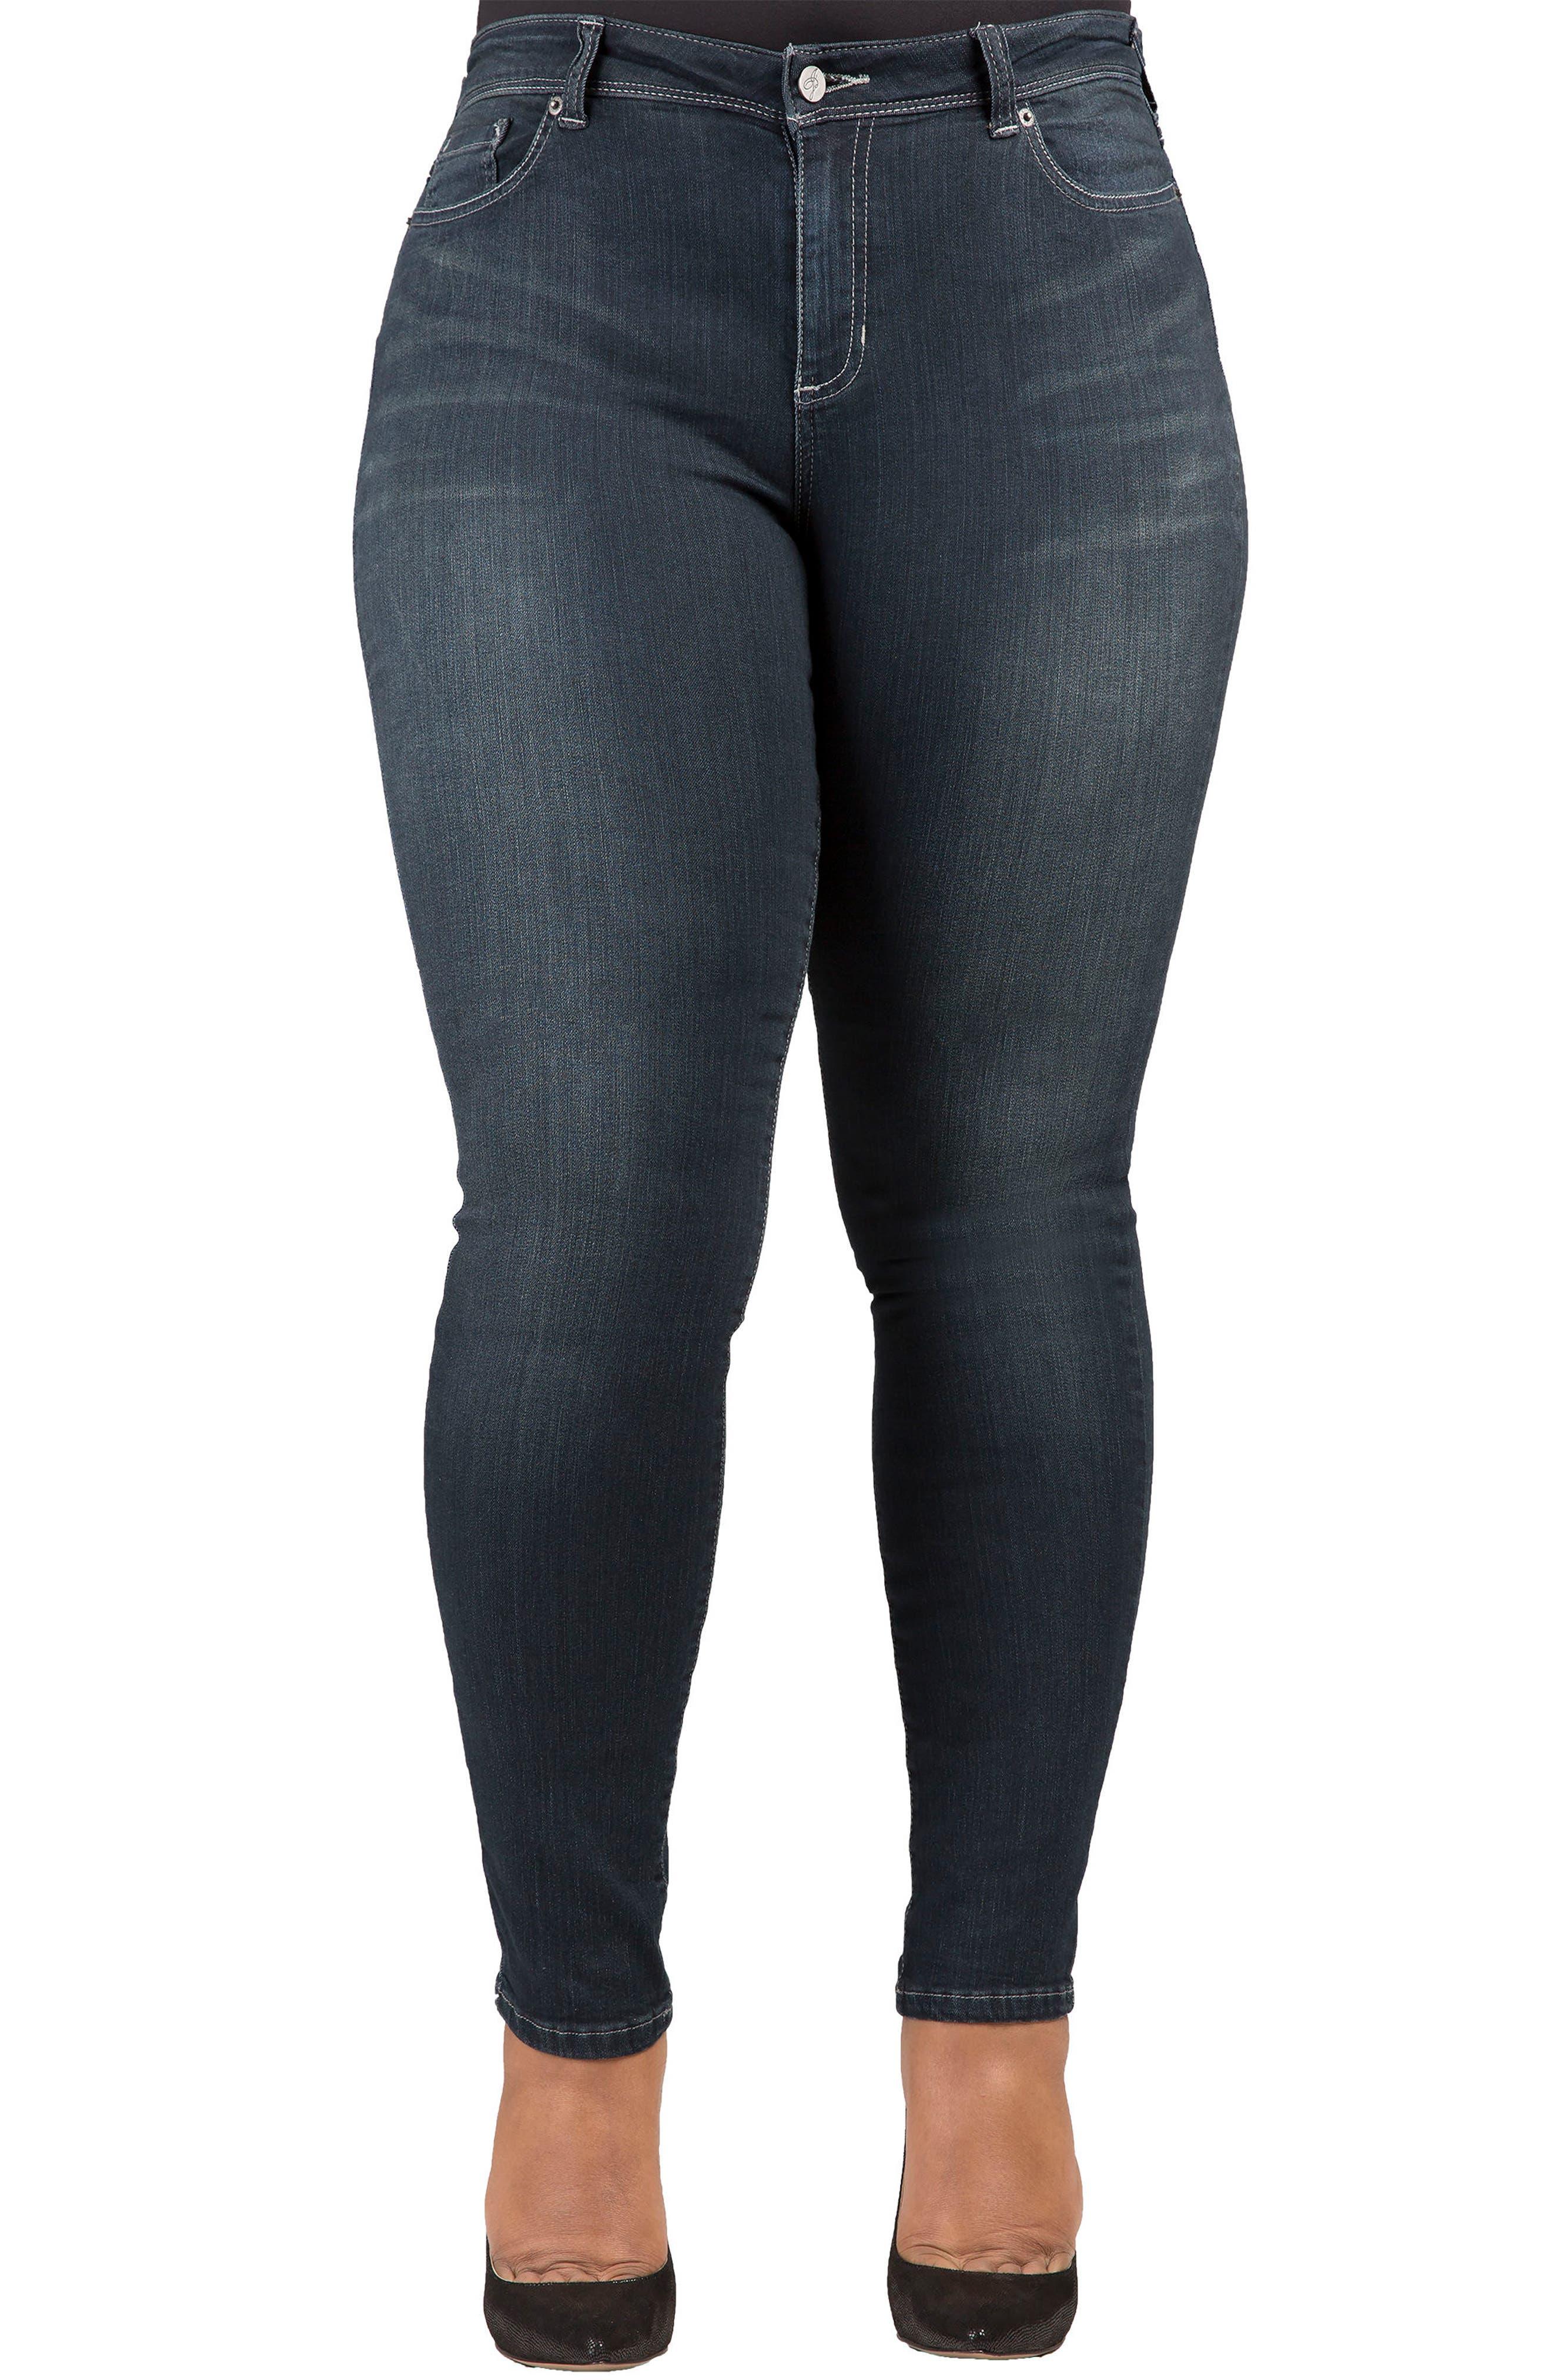 Alternate Image 1 Selected - Poetic Justice 'Maya' Stretch Skinny Jeans (Dark Blue) (Plus Size)